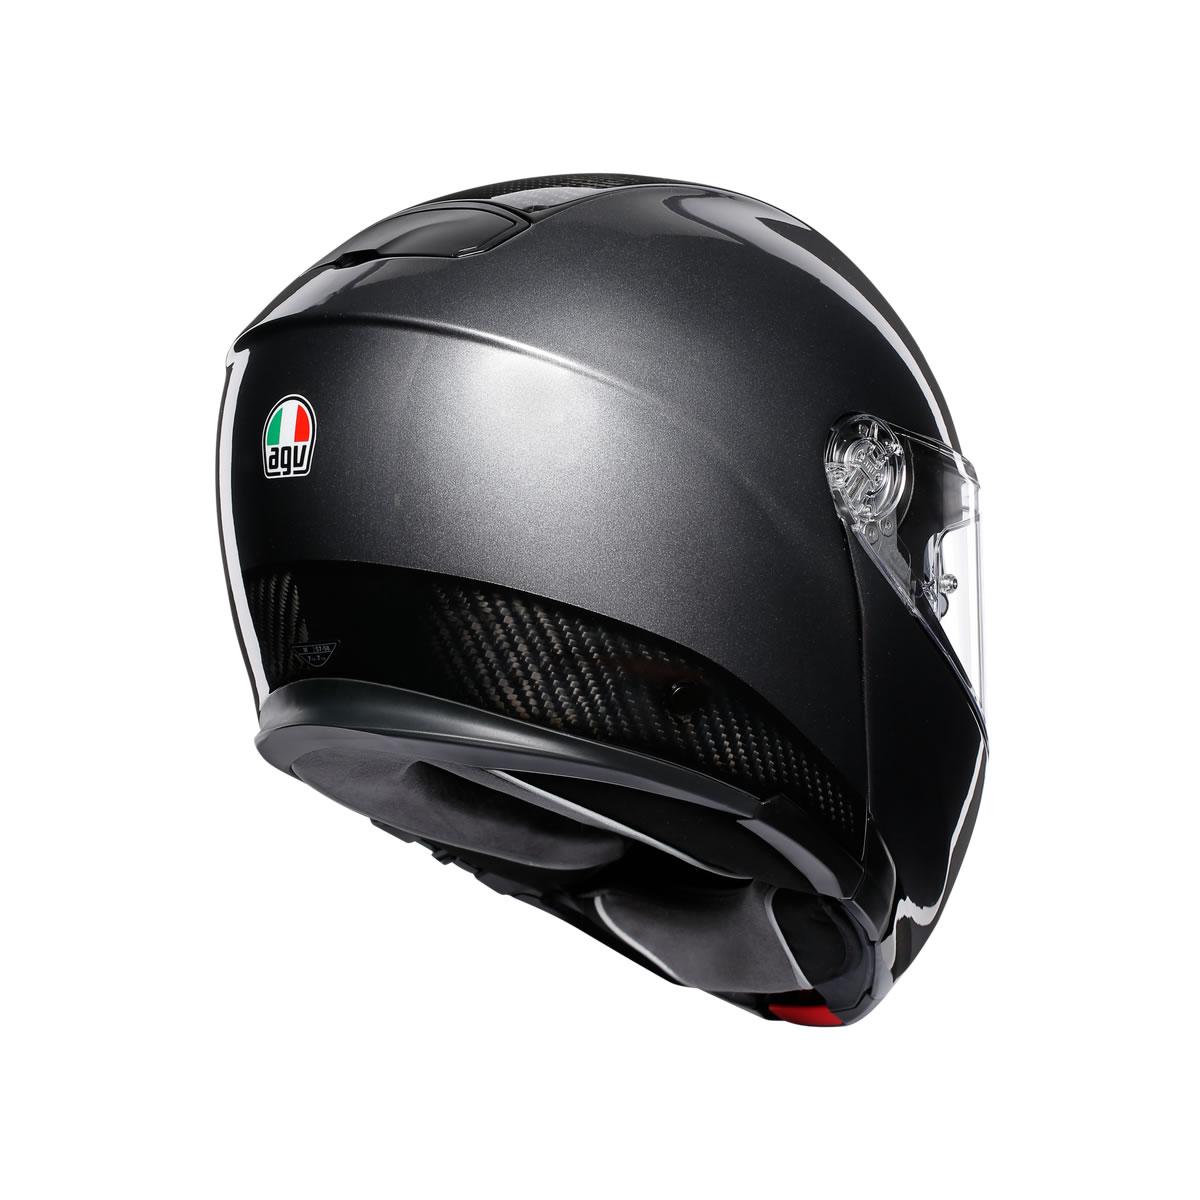 Agv Sports Modular Mono Gloss Carbon Dark Grey M S Motorcycles Shop Newcastle